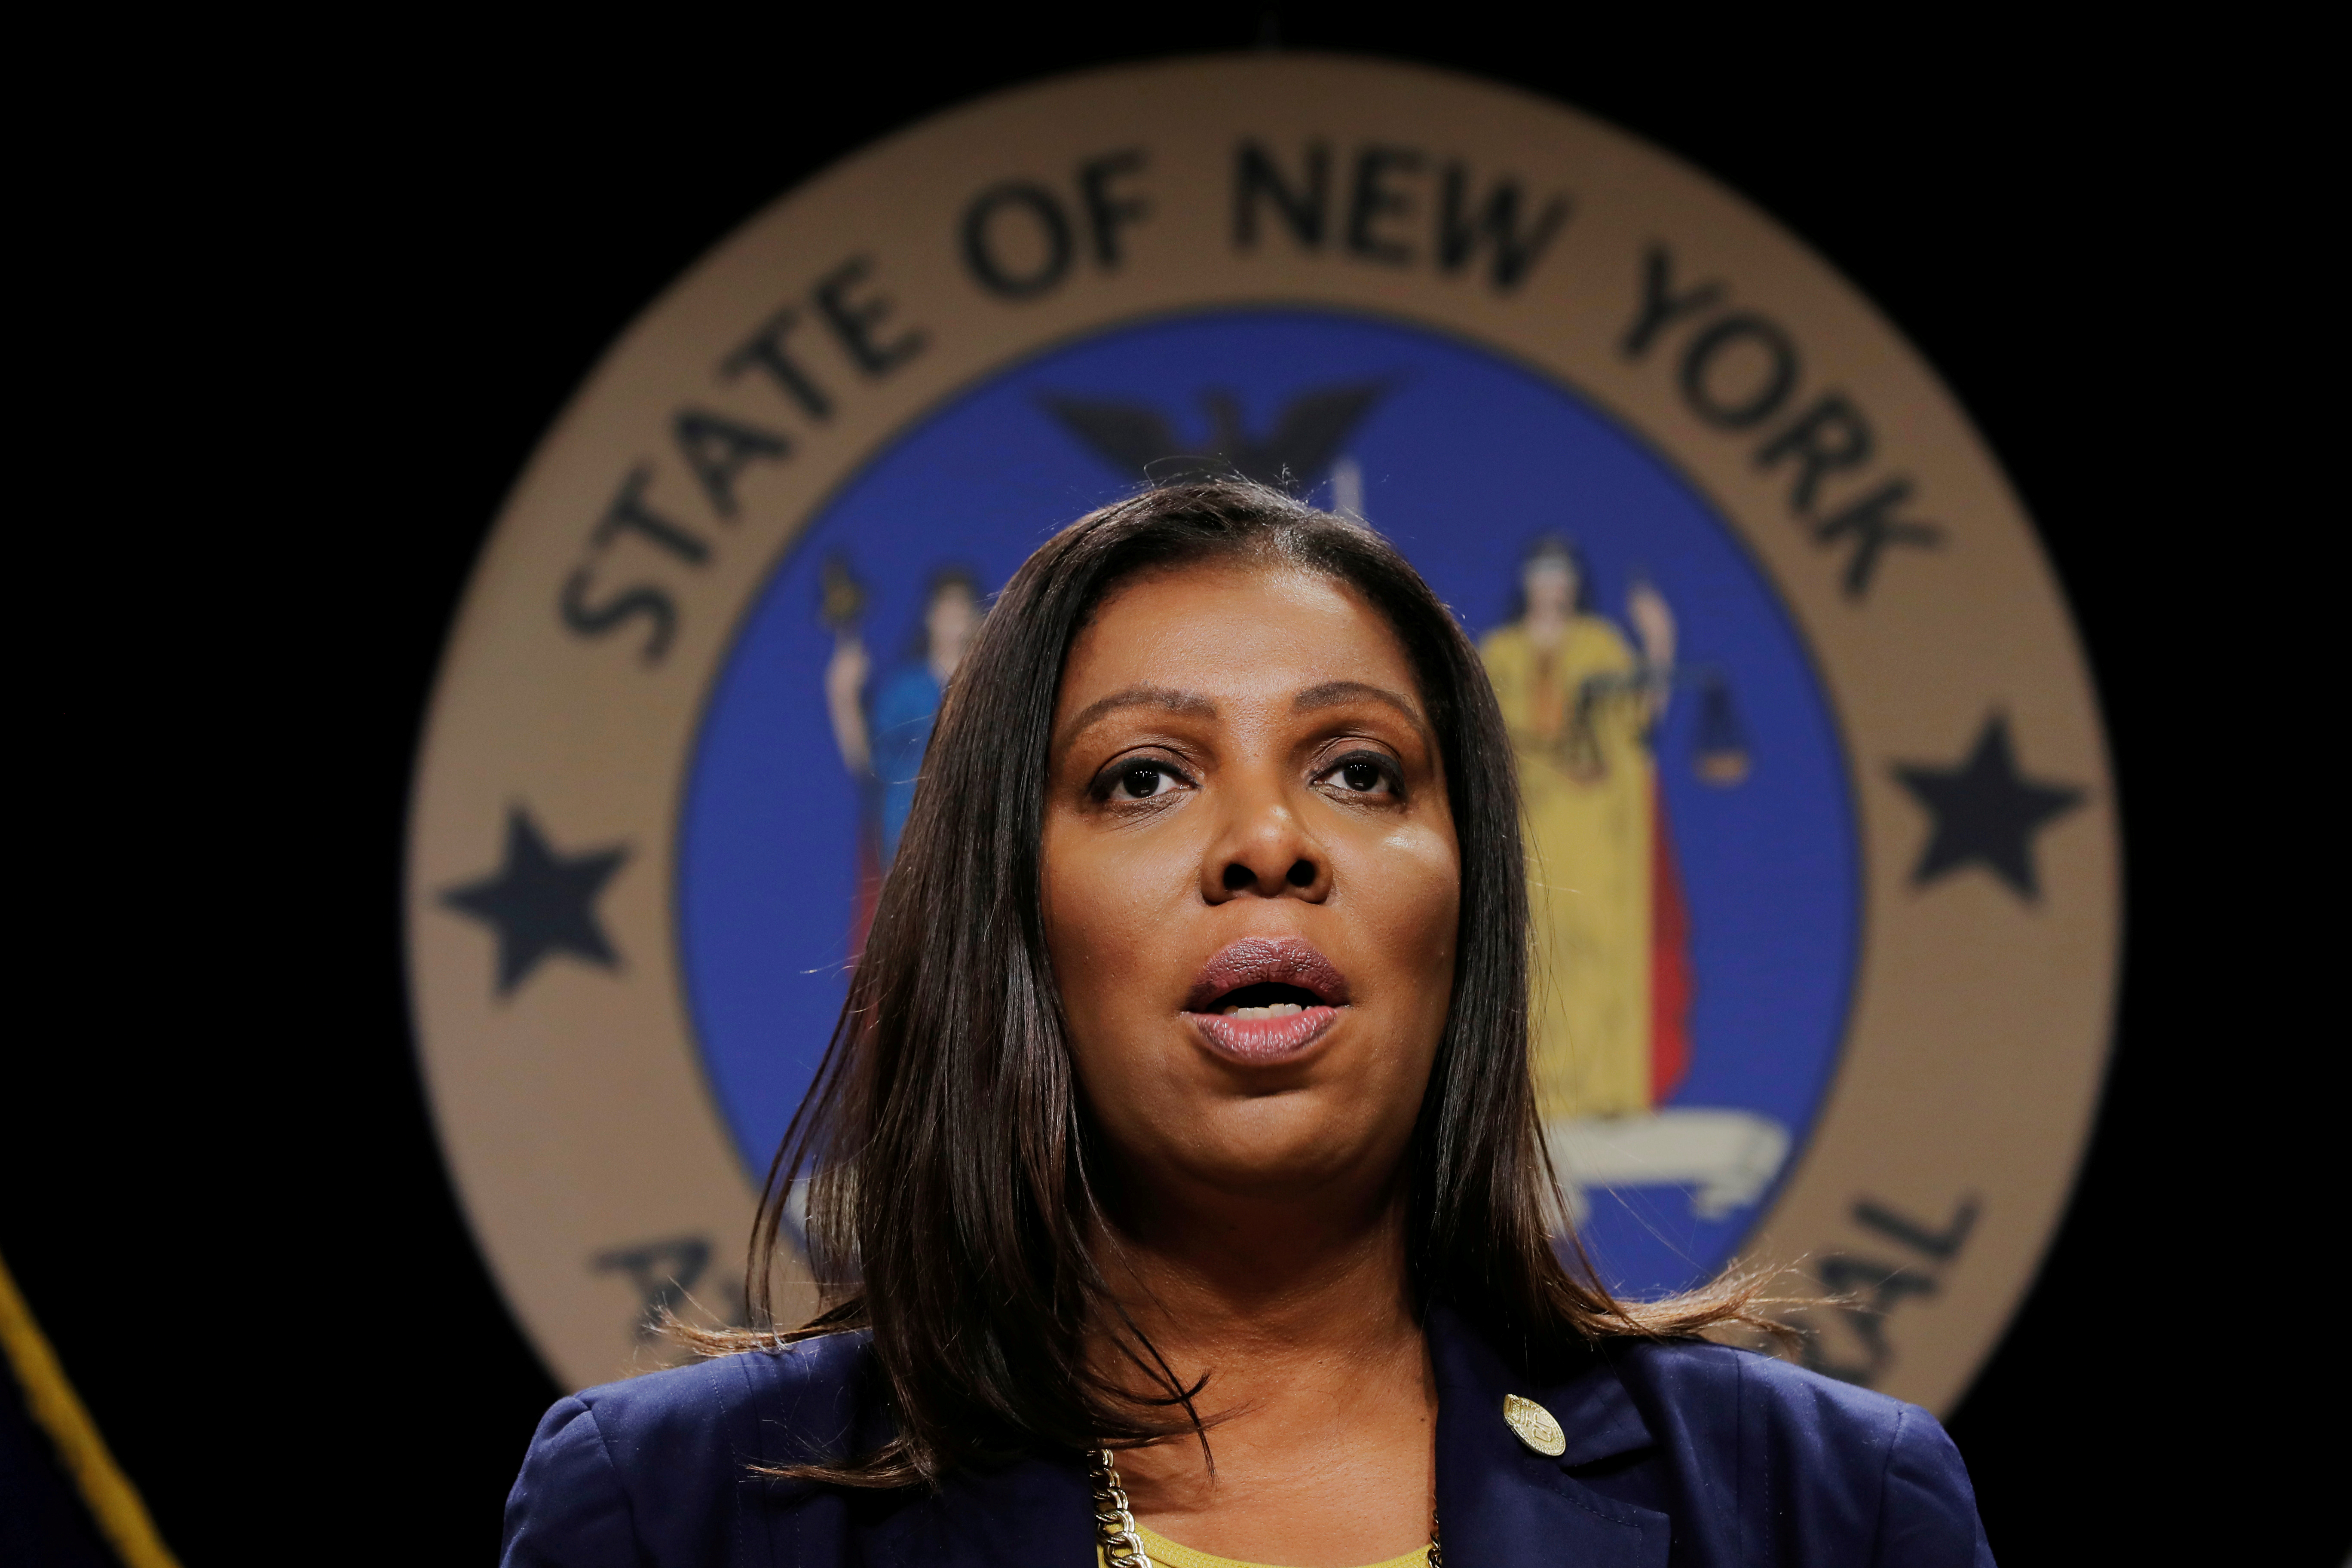 New York State Attorney General Letitia James in New York City, U.S., November 19, 2019.  REUTERS/Lucas Jackson